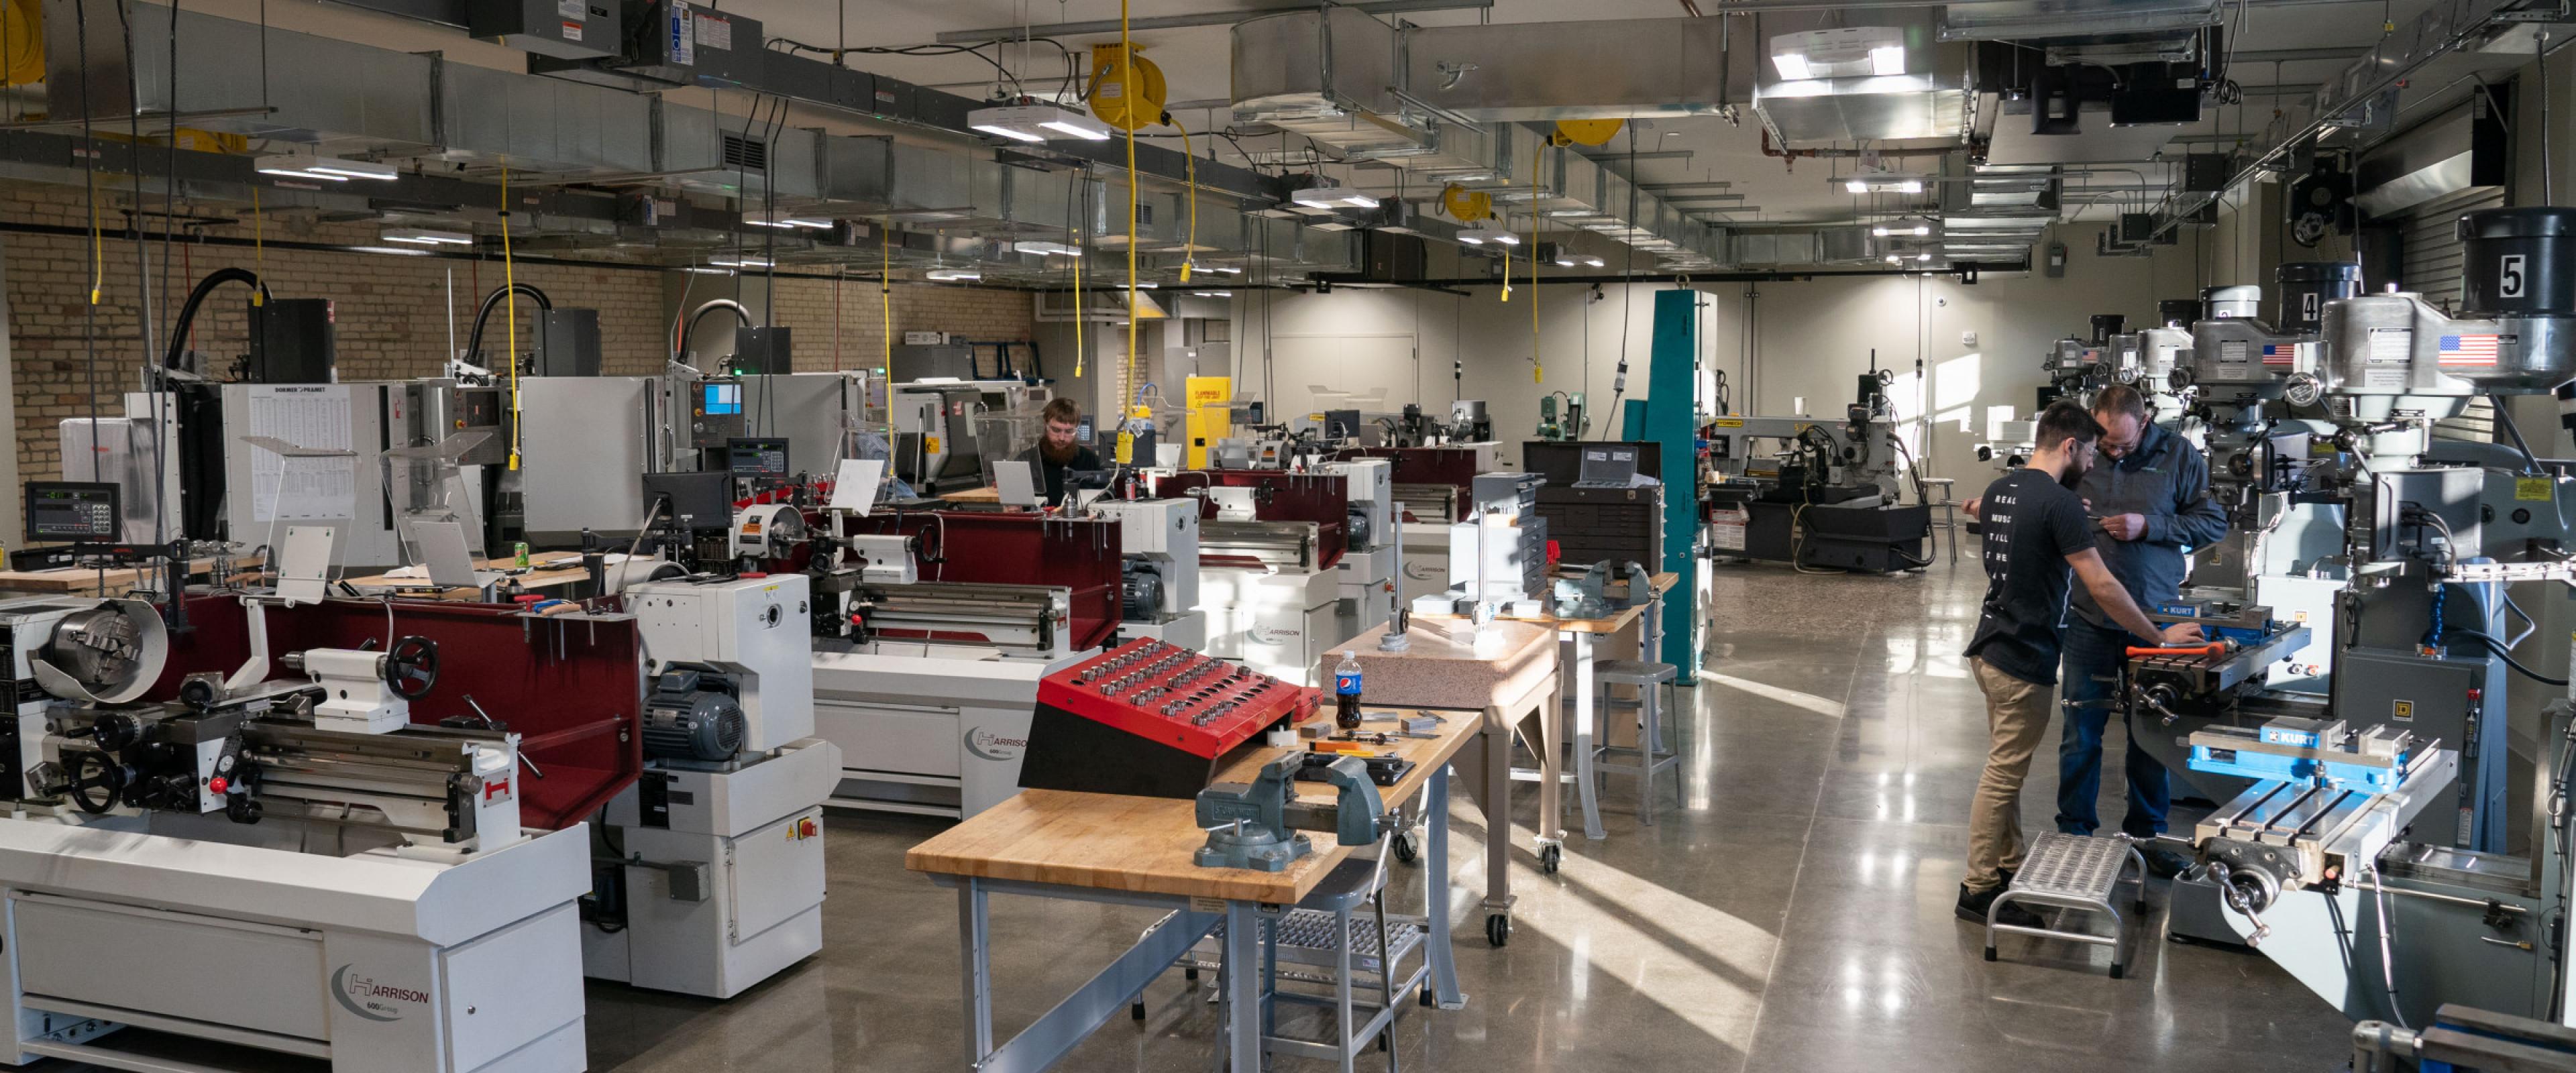 Equipment at AMP Lab at WMU